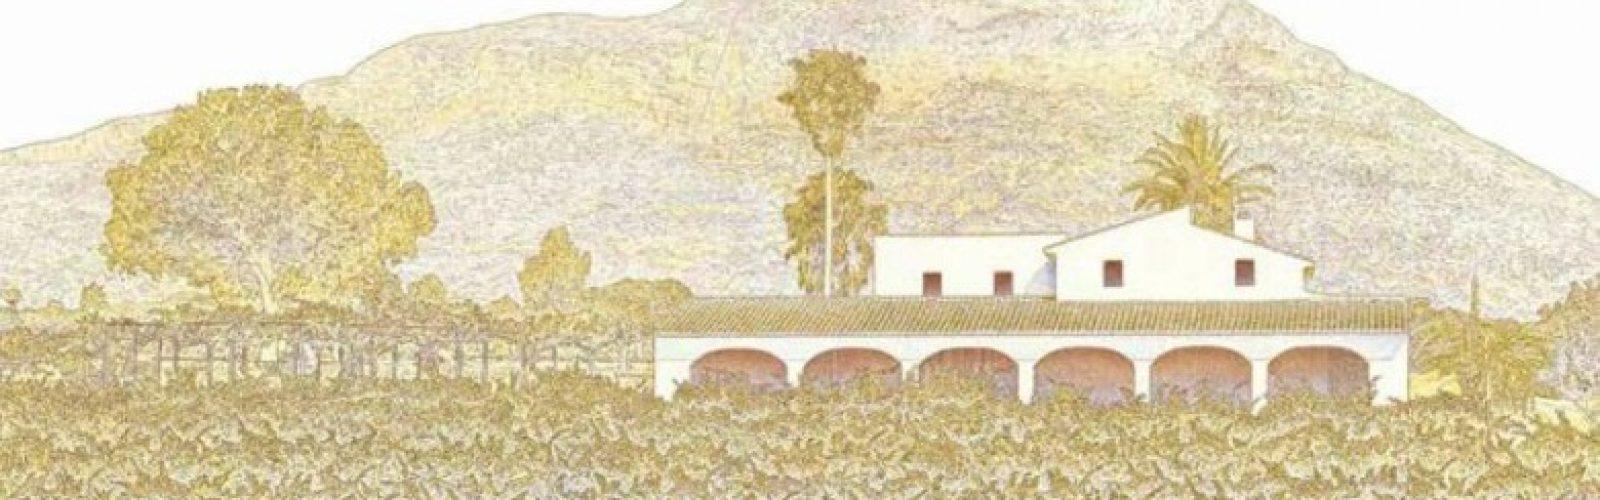 Vino-castadiva-pricipedesalinas-rojoynegro-bodegas-gutierrezdelavega-comercial-tabarca-distribucion-de-bebidas-y-alimentacion-alicante-bodega